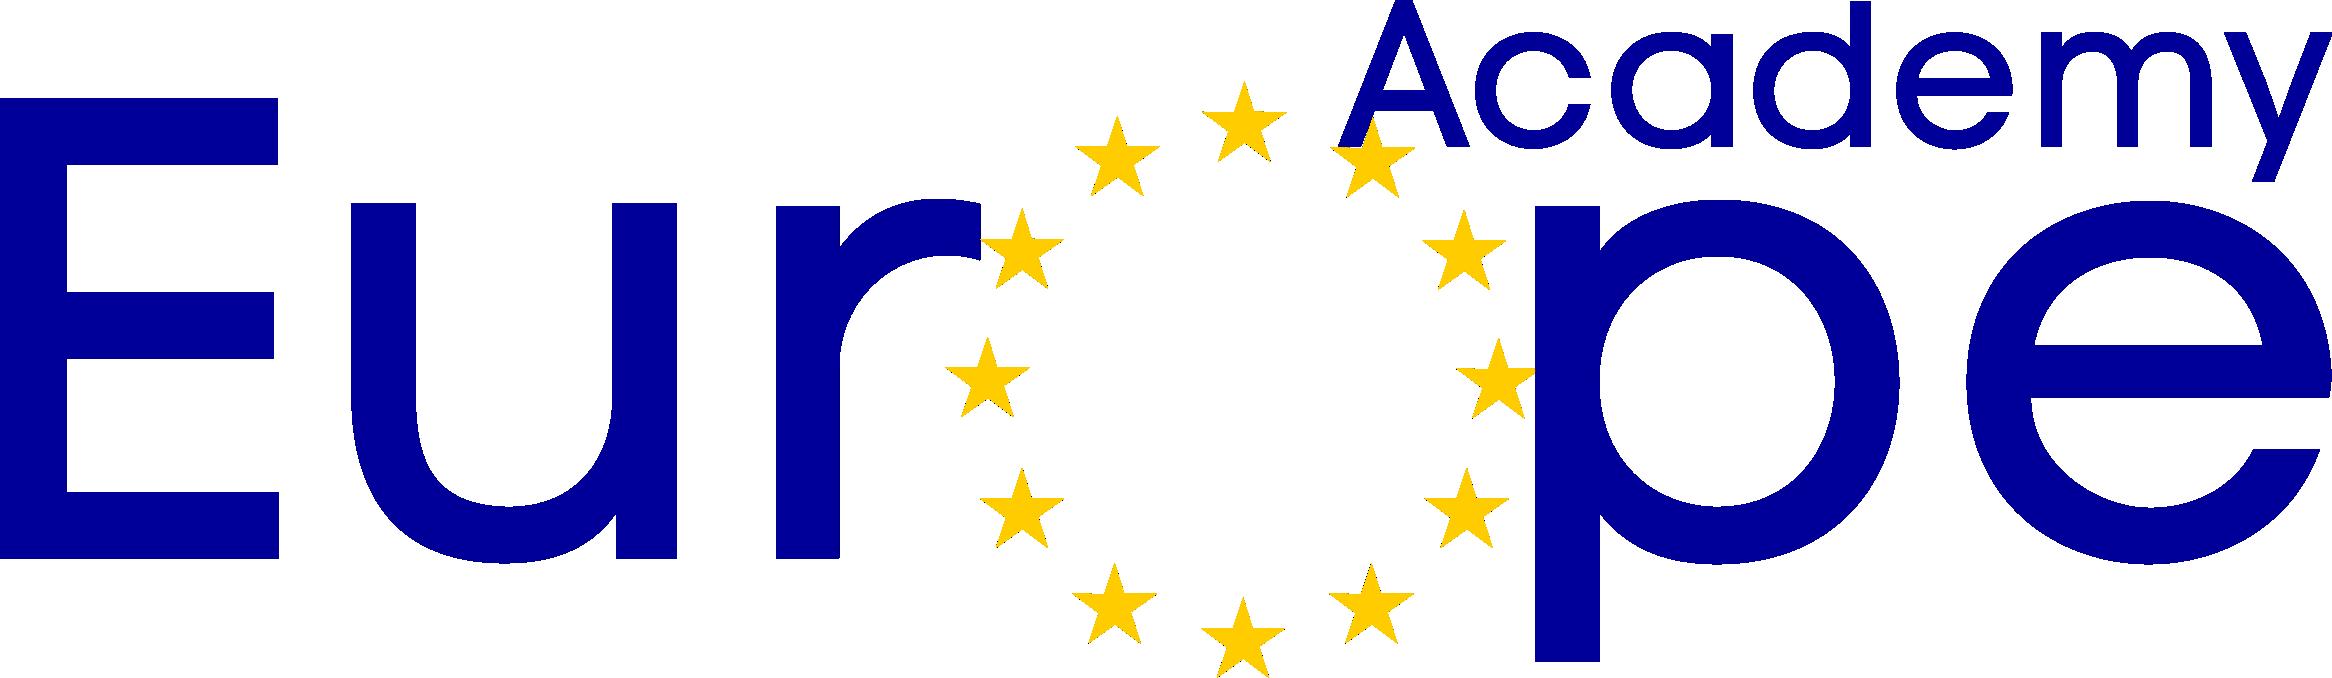 Academy Europe